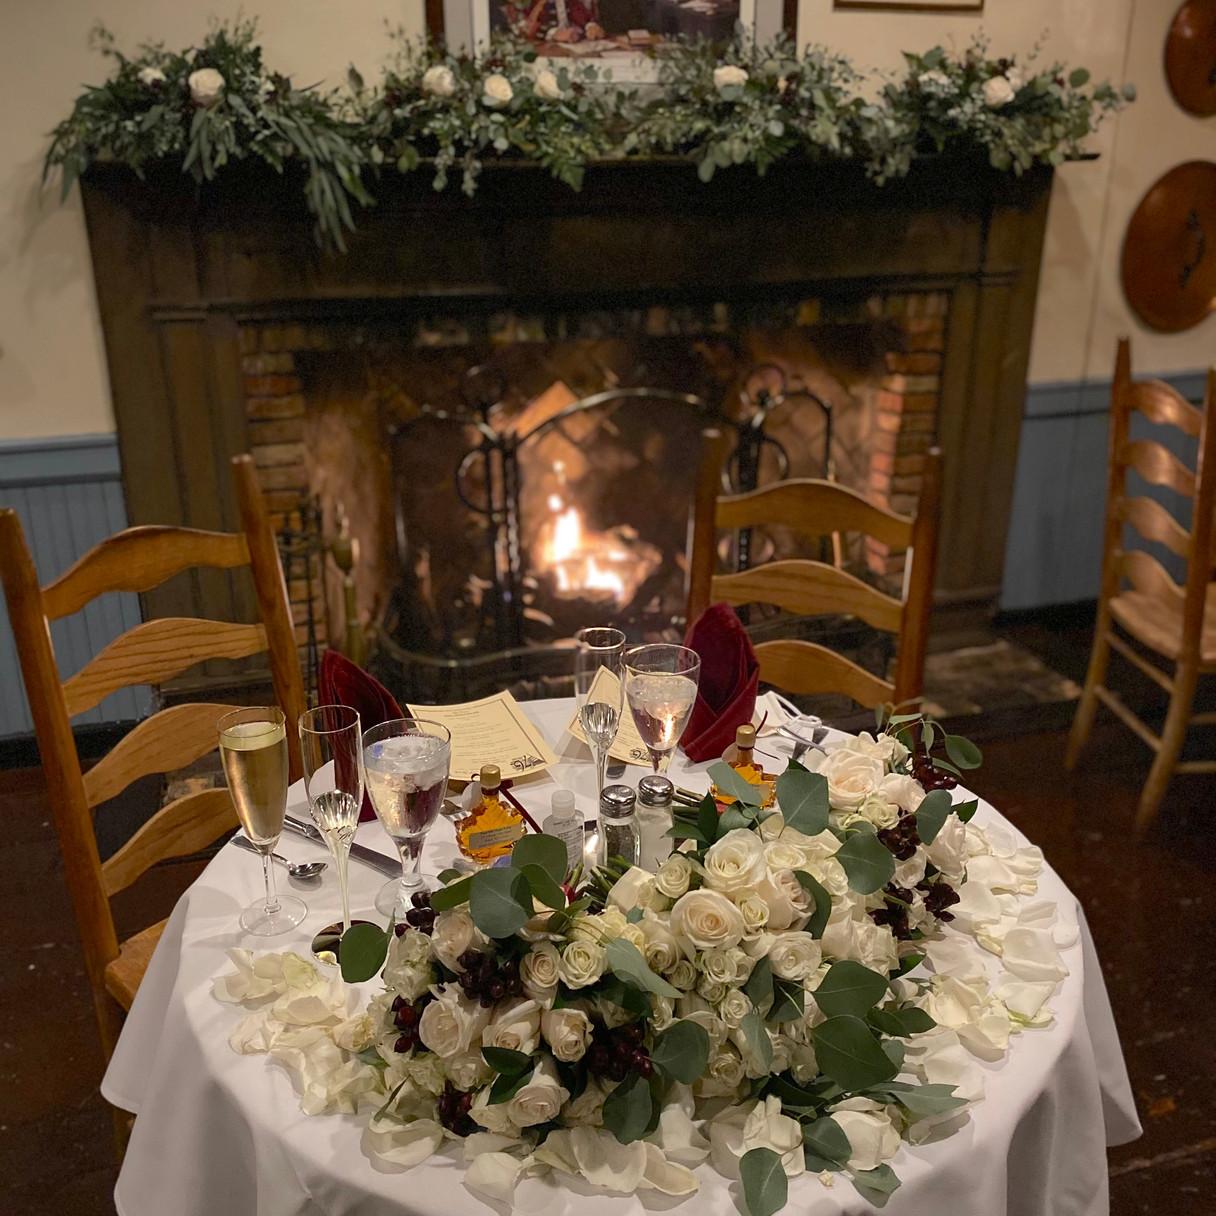 Wedding - Flowers on Table & Mantle - 76